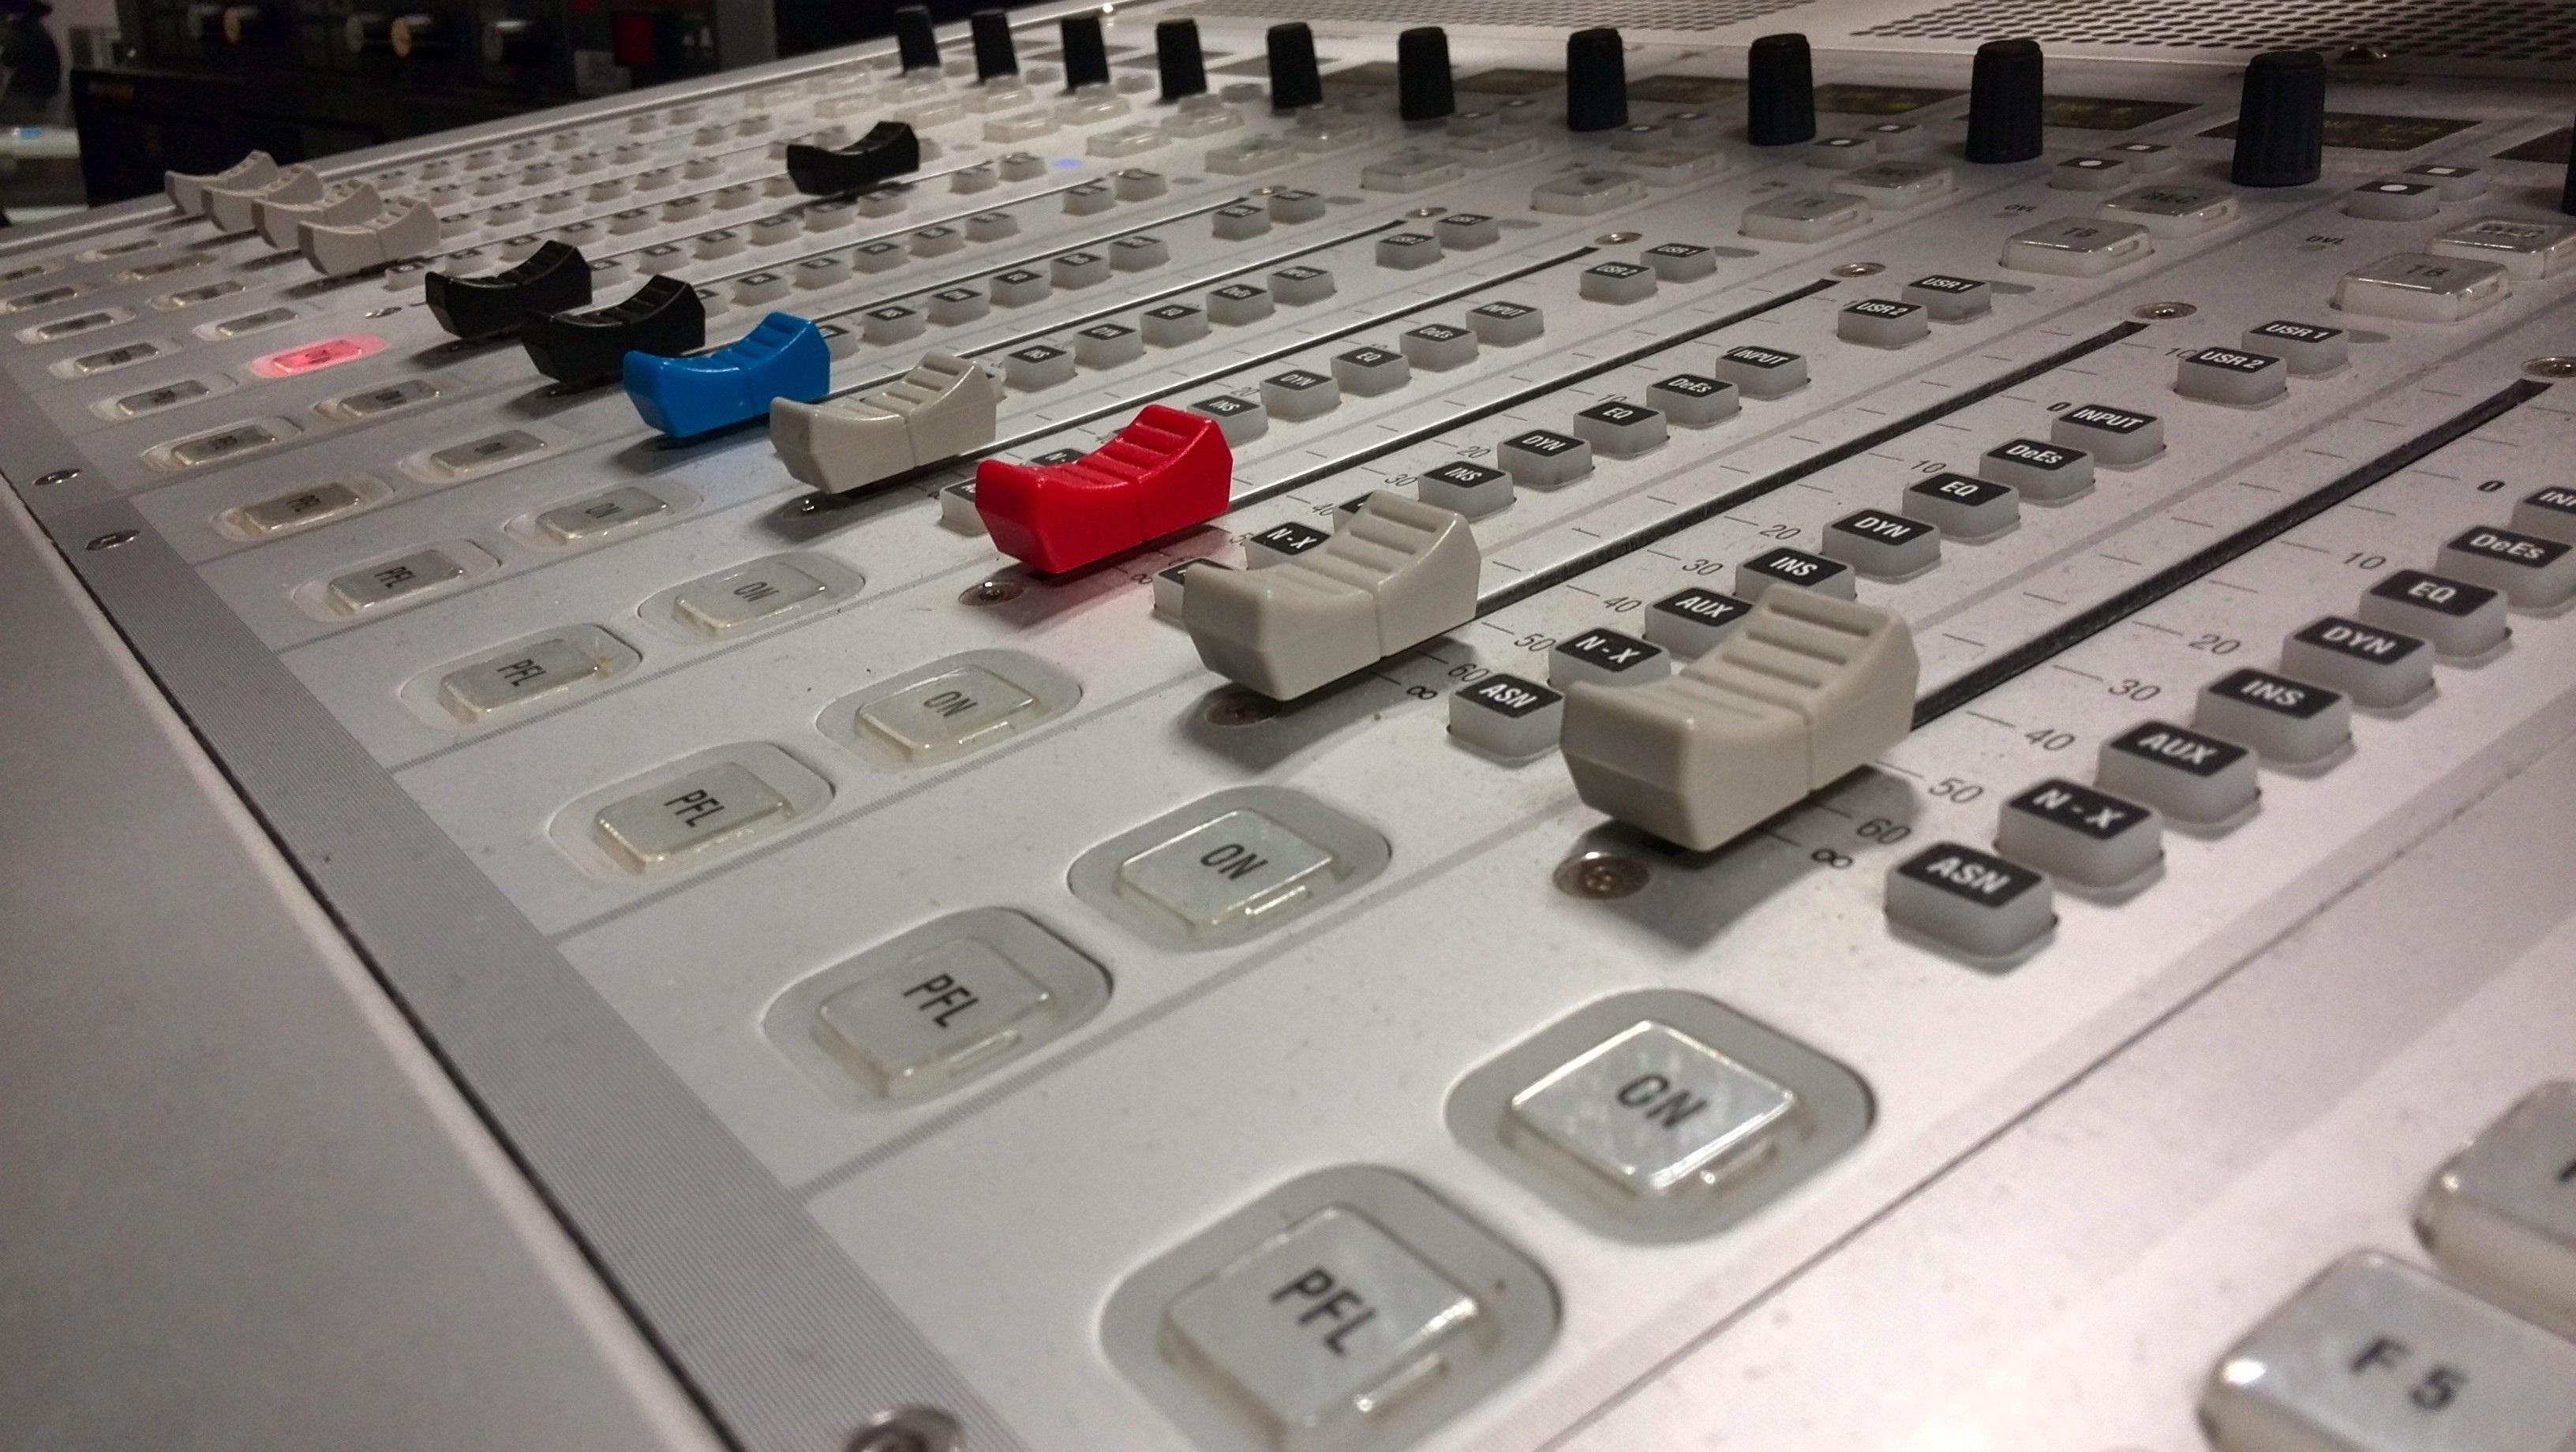 Free Images : music, technology, equipment, studio